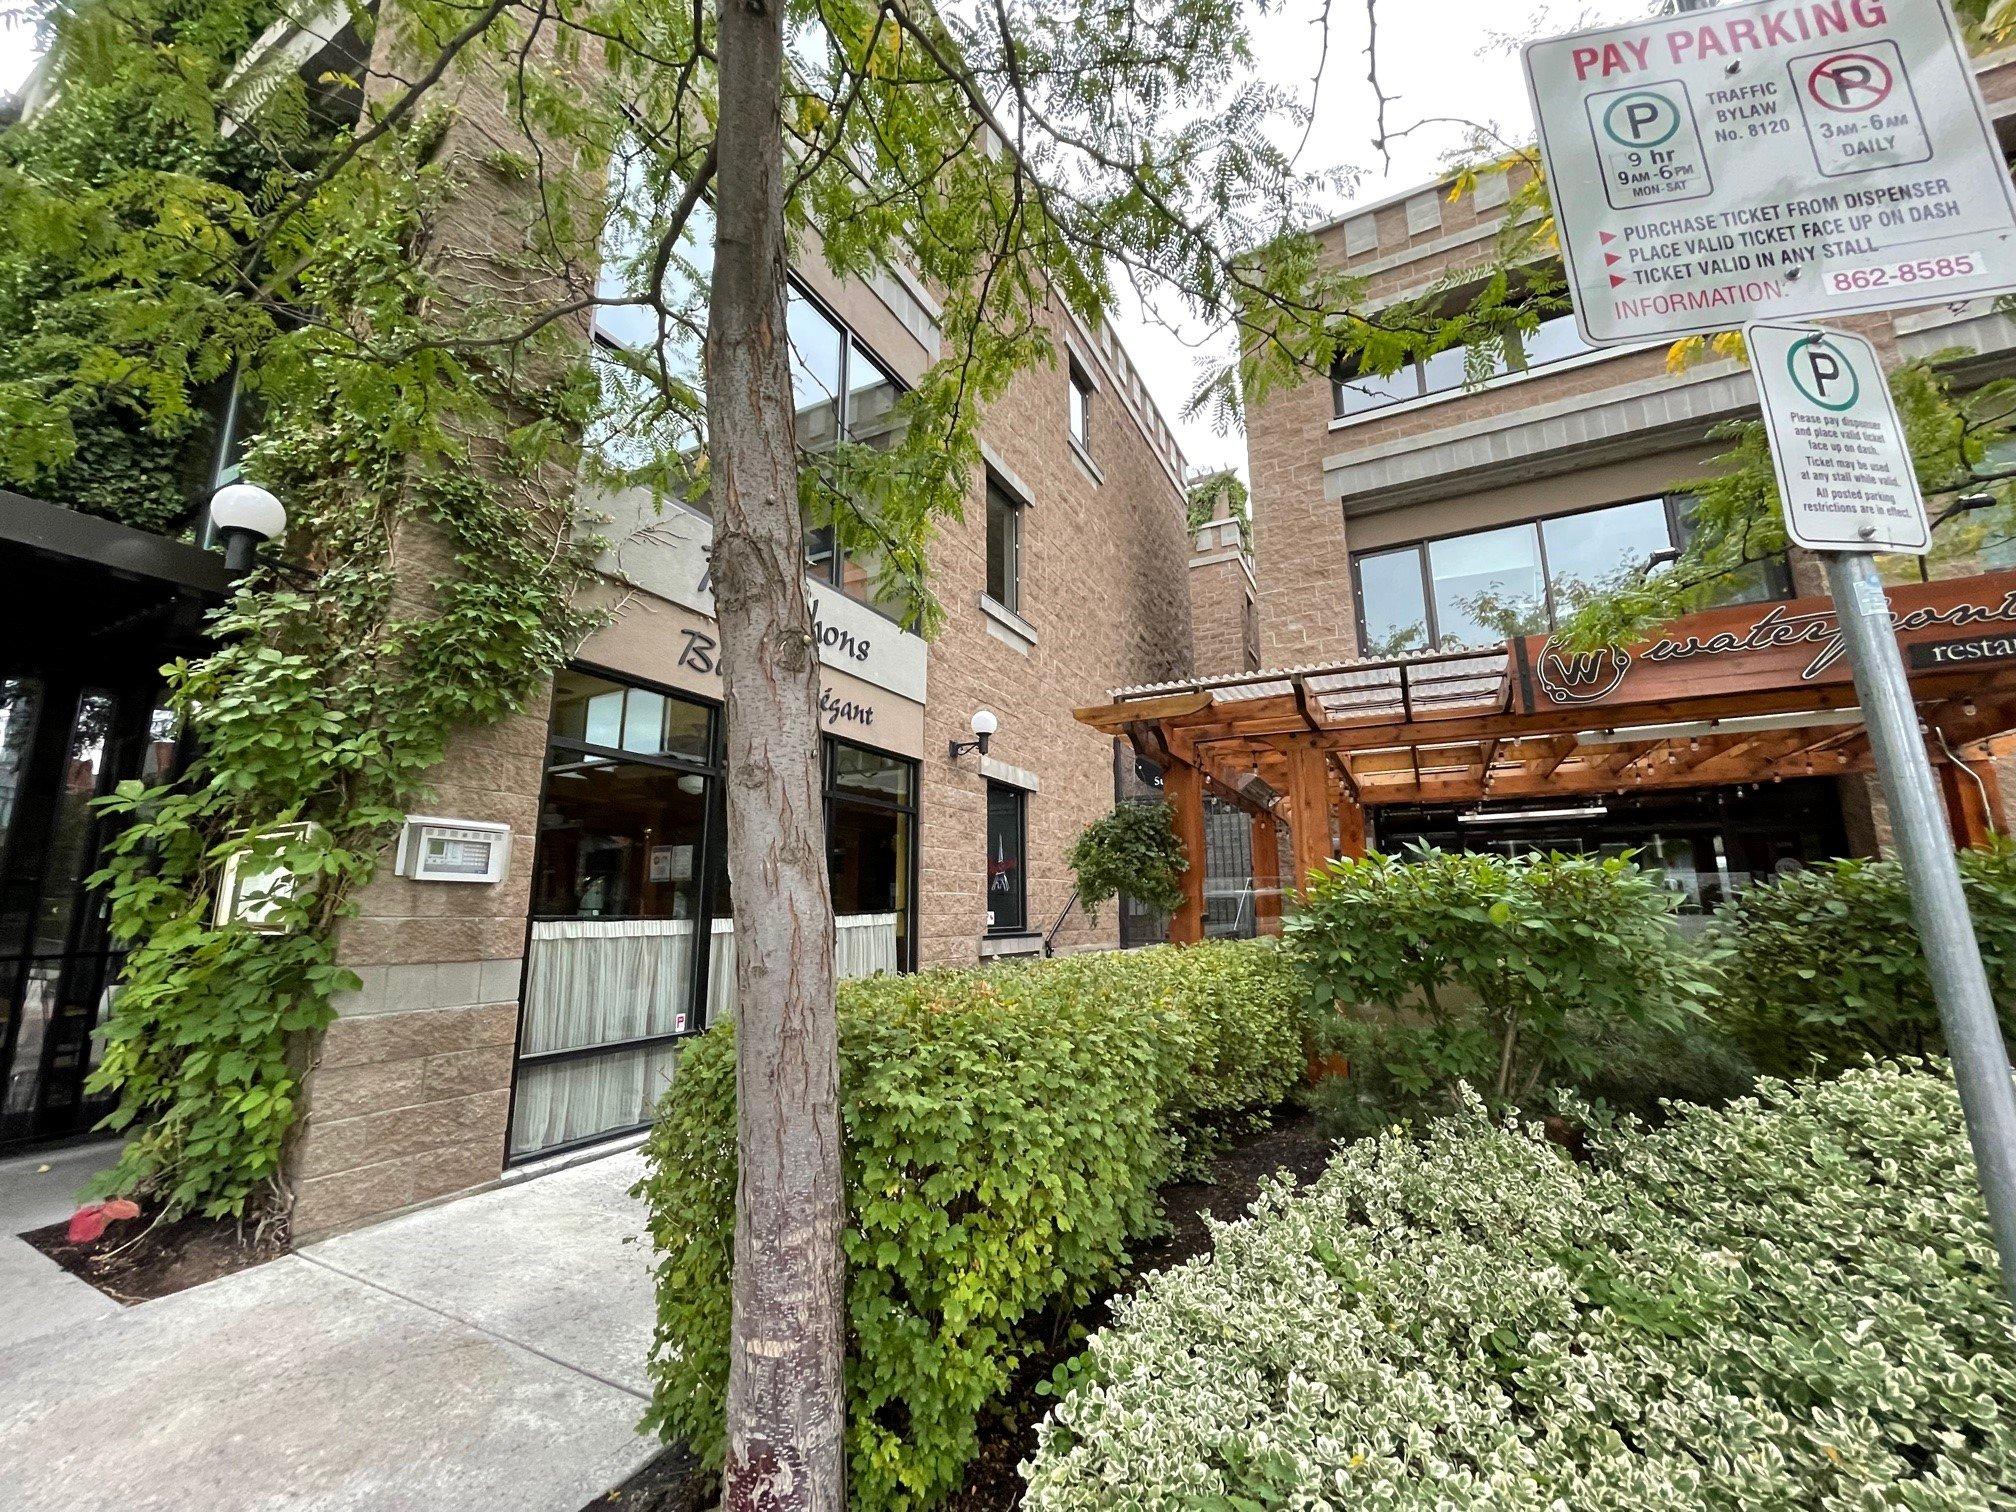 #206-1180 Sunset Drive, Kelowna, BC - Second Floor Office Space in Kelowna